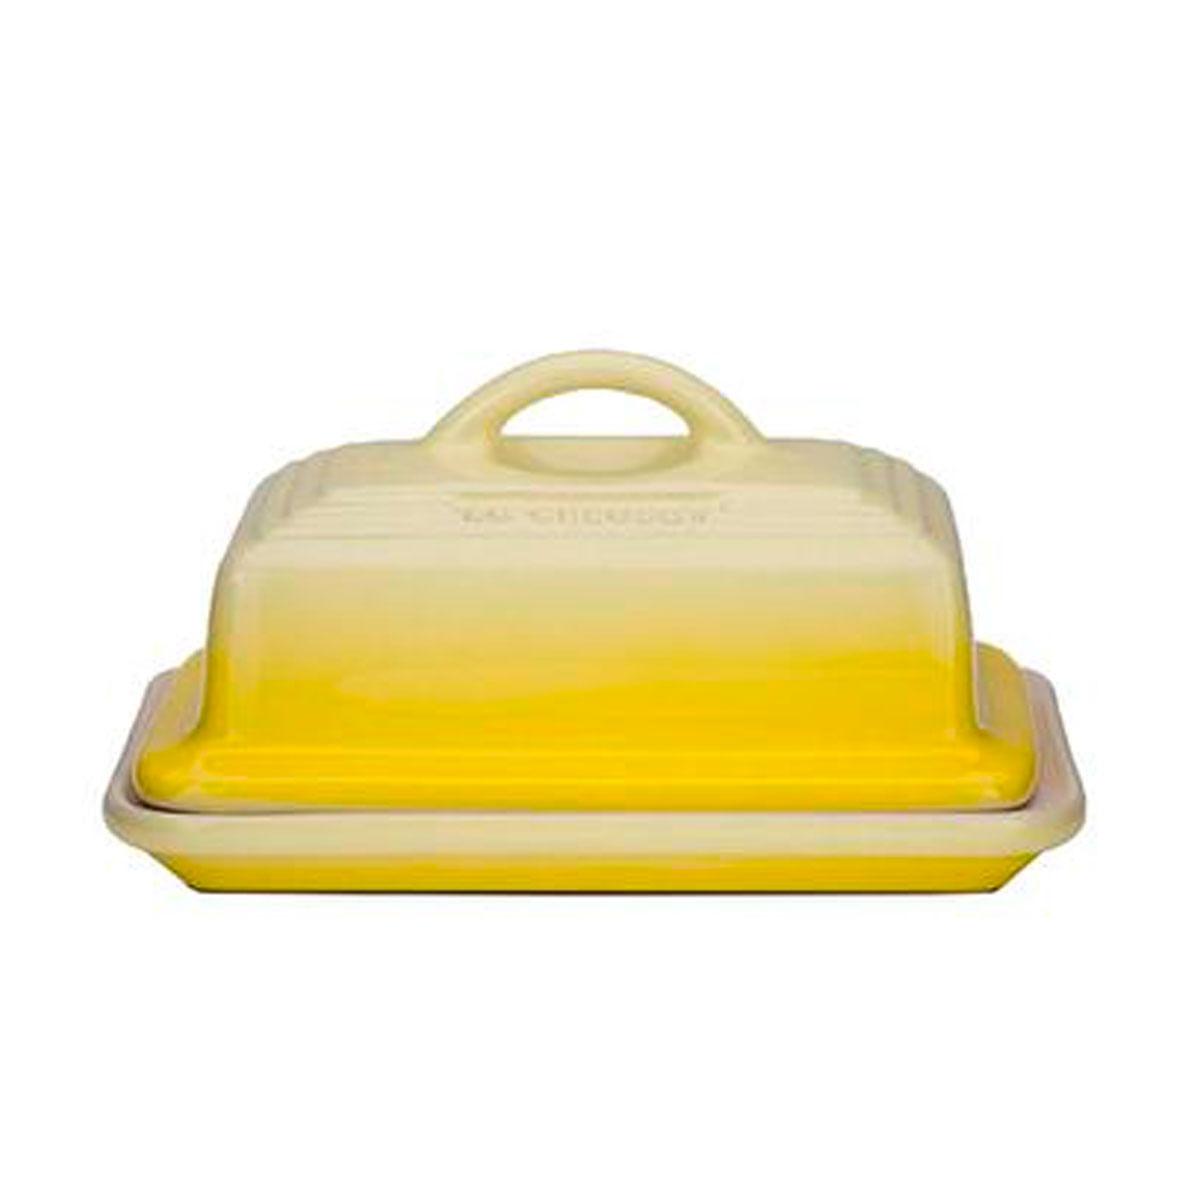 Mantegueira Nova Cerâmica Amarelo Soleil Le Creuset